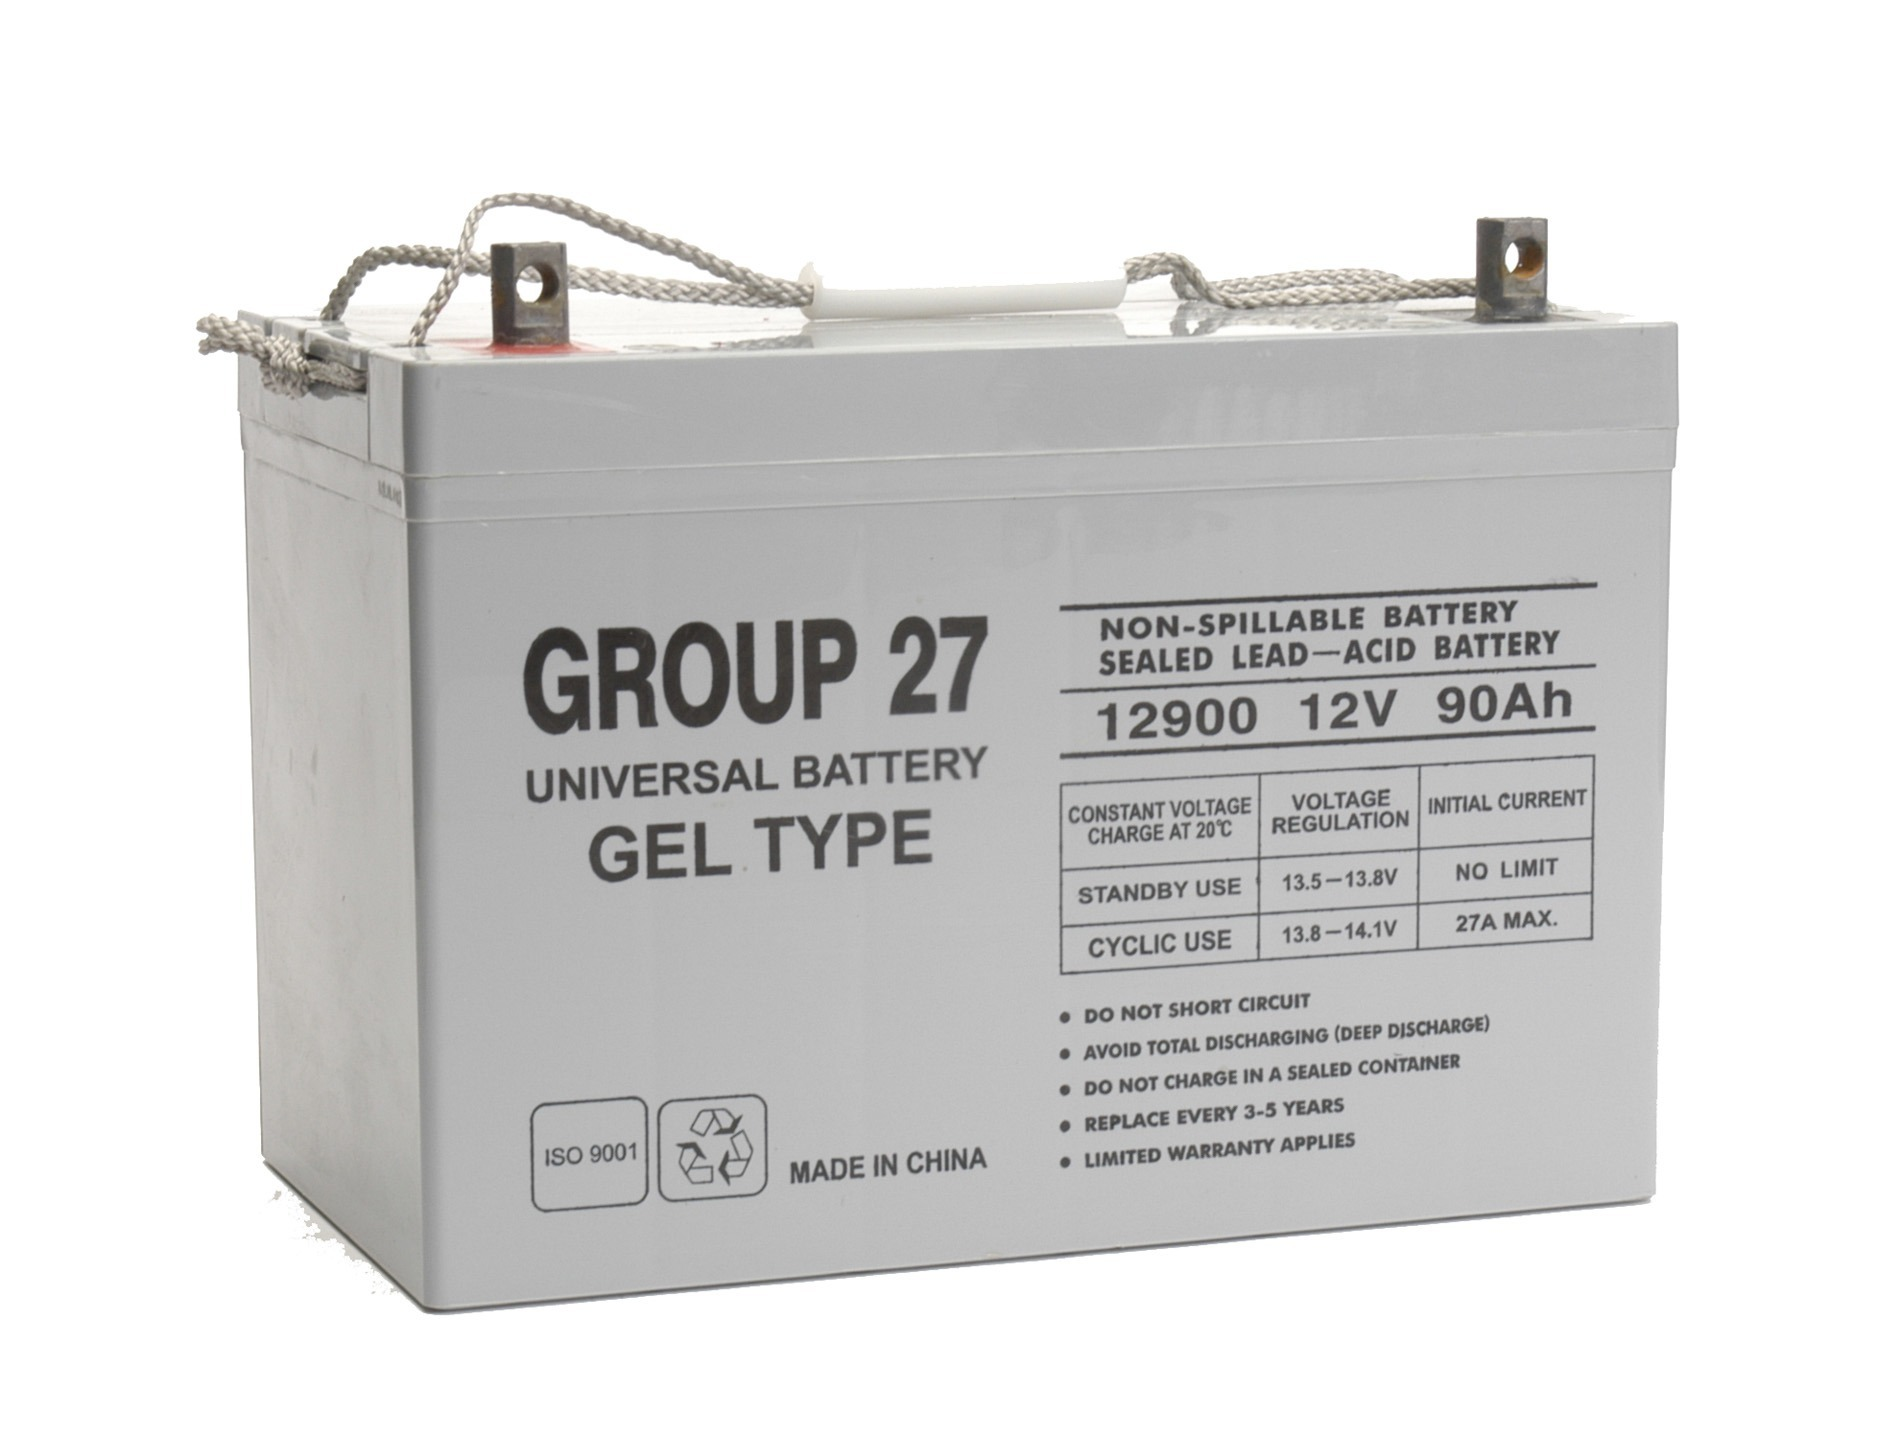 UB12900 (Group 27) 12v 90ah Gel Battery for Wheelcare Sporster Stretch